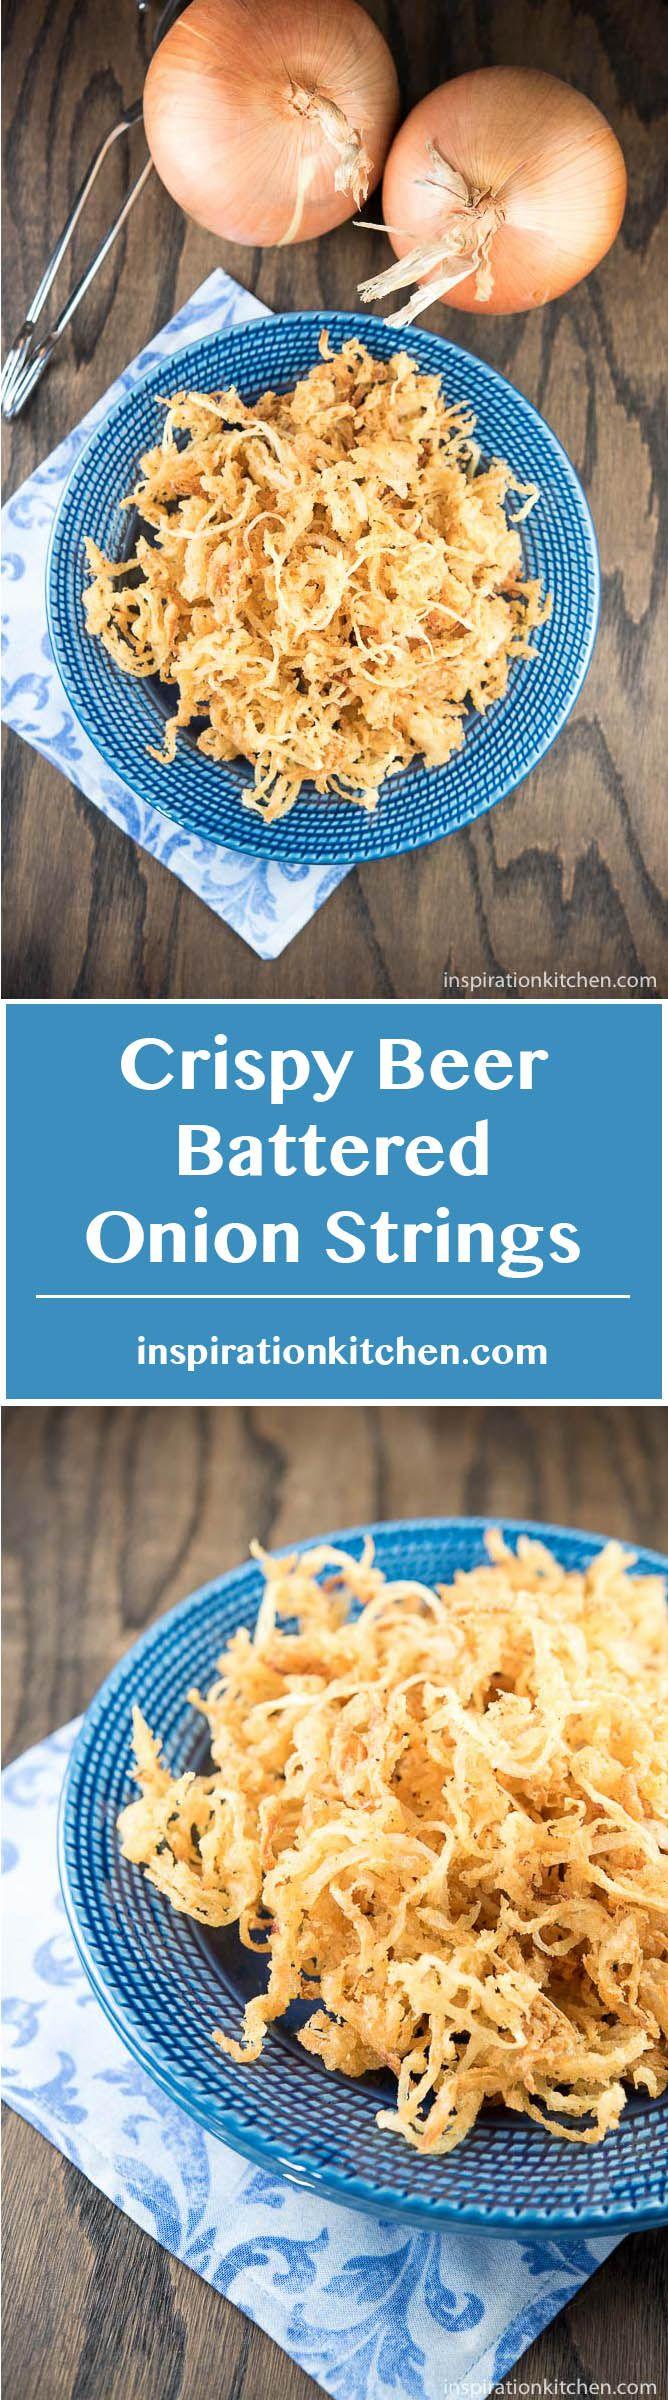 Crispy Beer Battered Onion Strings - inspirationkitchen.com